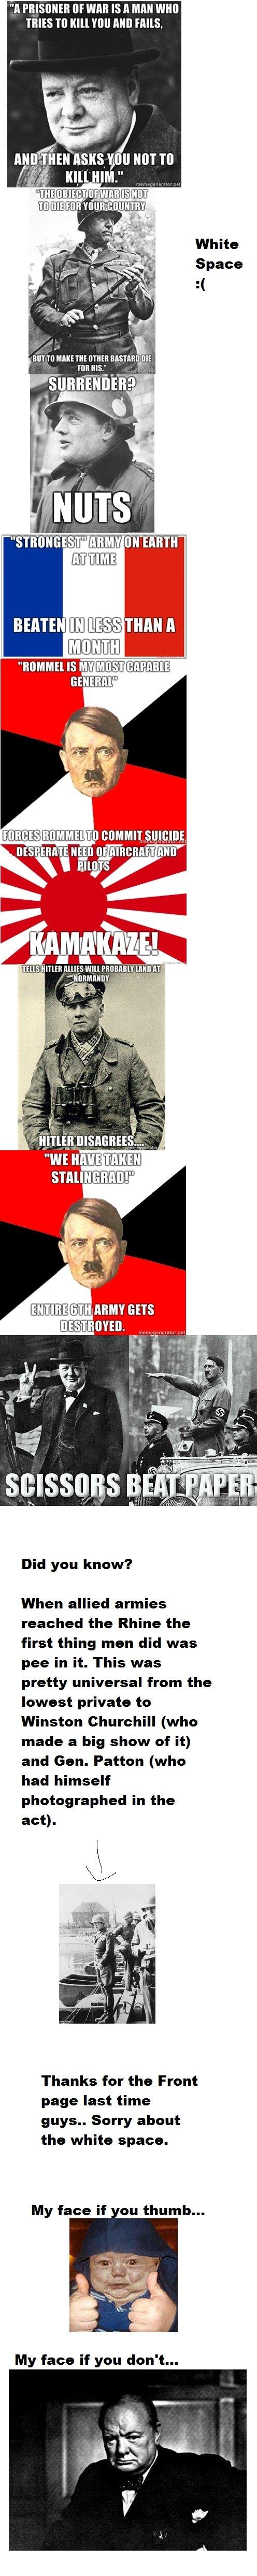 ww2 leaders comp. pt.2. As promised... Part 1 : /funny_pictures/1973719/ww2+leaders+c.... II ', III WAR IS I MINI WIN] HILLS TI] KILL Hill MID HILLS. Mi M! M, I wwII comp Hitler War